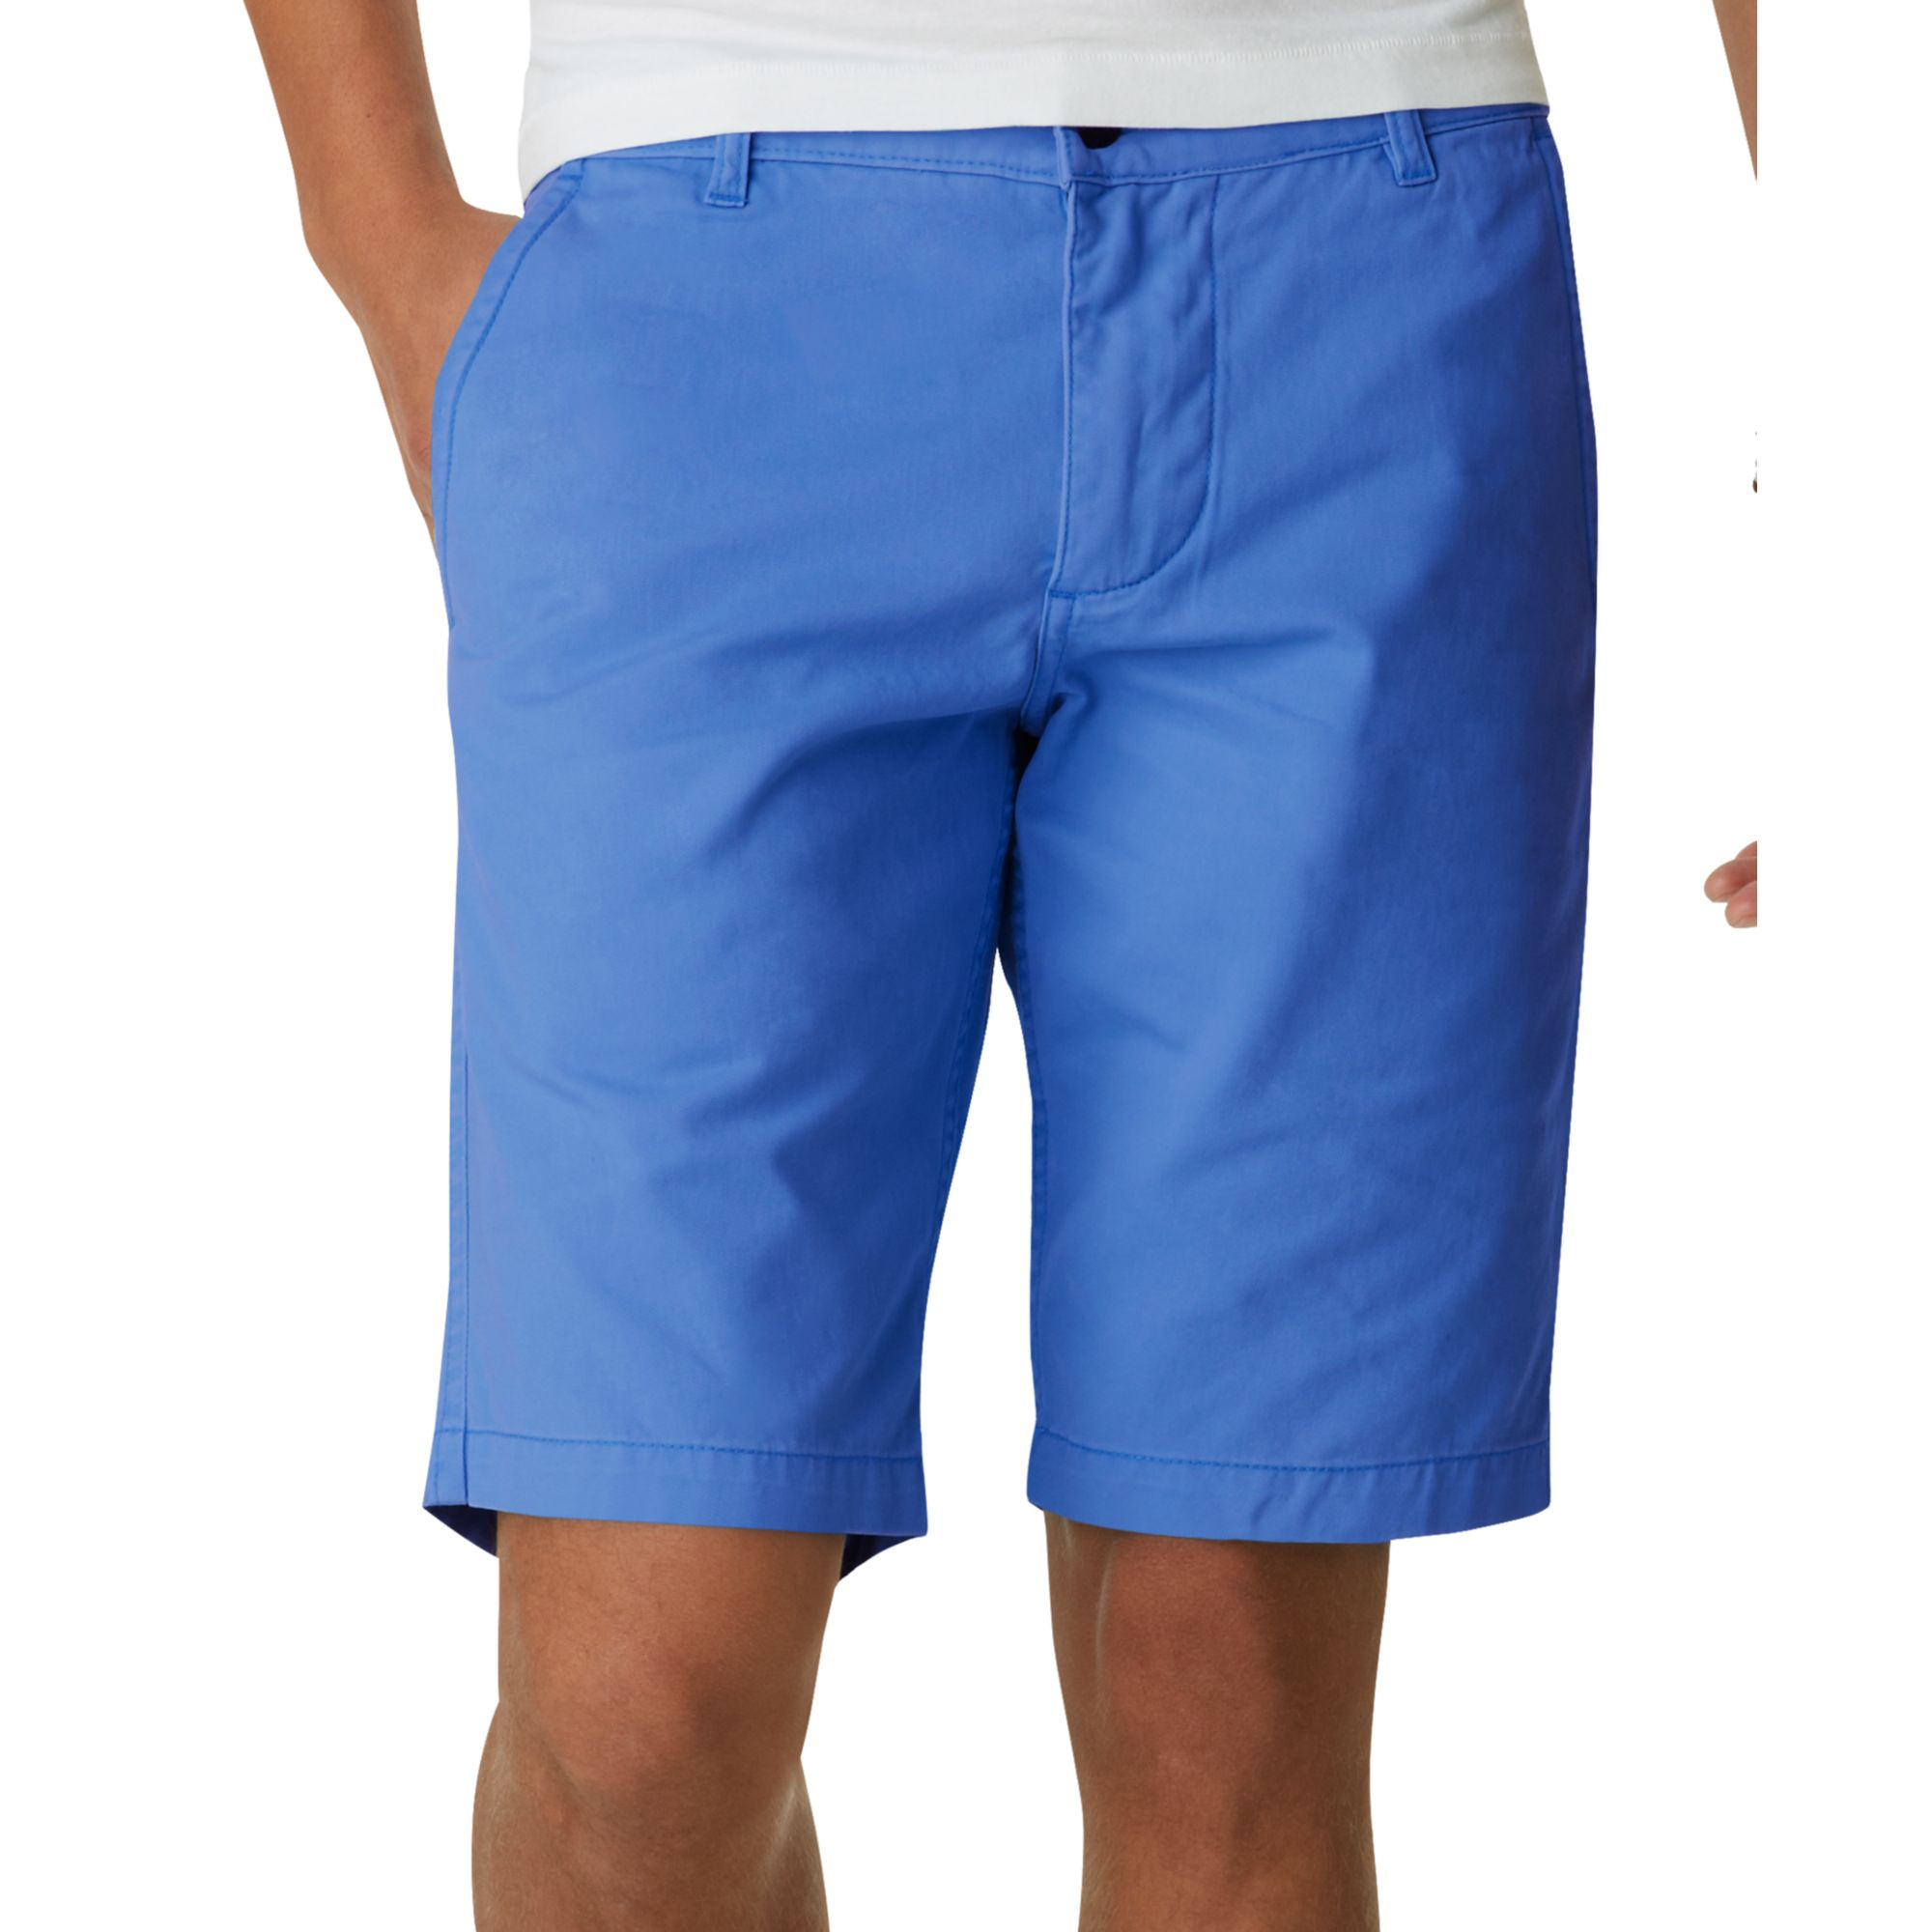 polo ralph lauren classic2 men's light blue chinos khakis pants classic fit new see more like this GAP Men's Slim Fit Linen Cotton Khaki Pants 33x30 NWT $70 New Khaki Light Blue Brand New.